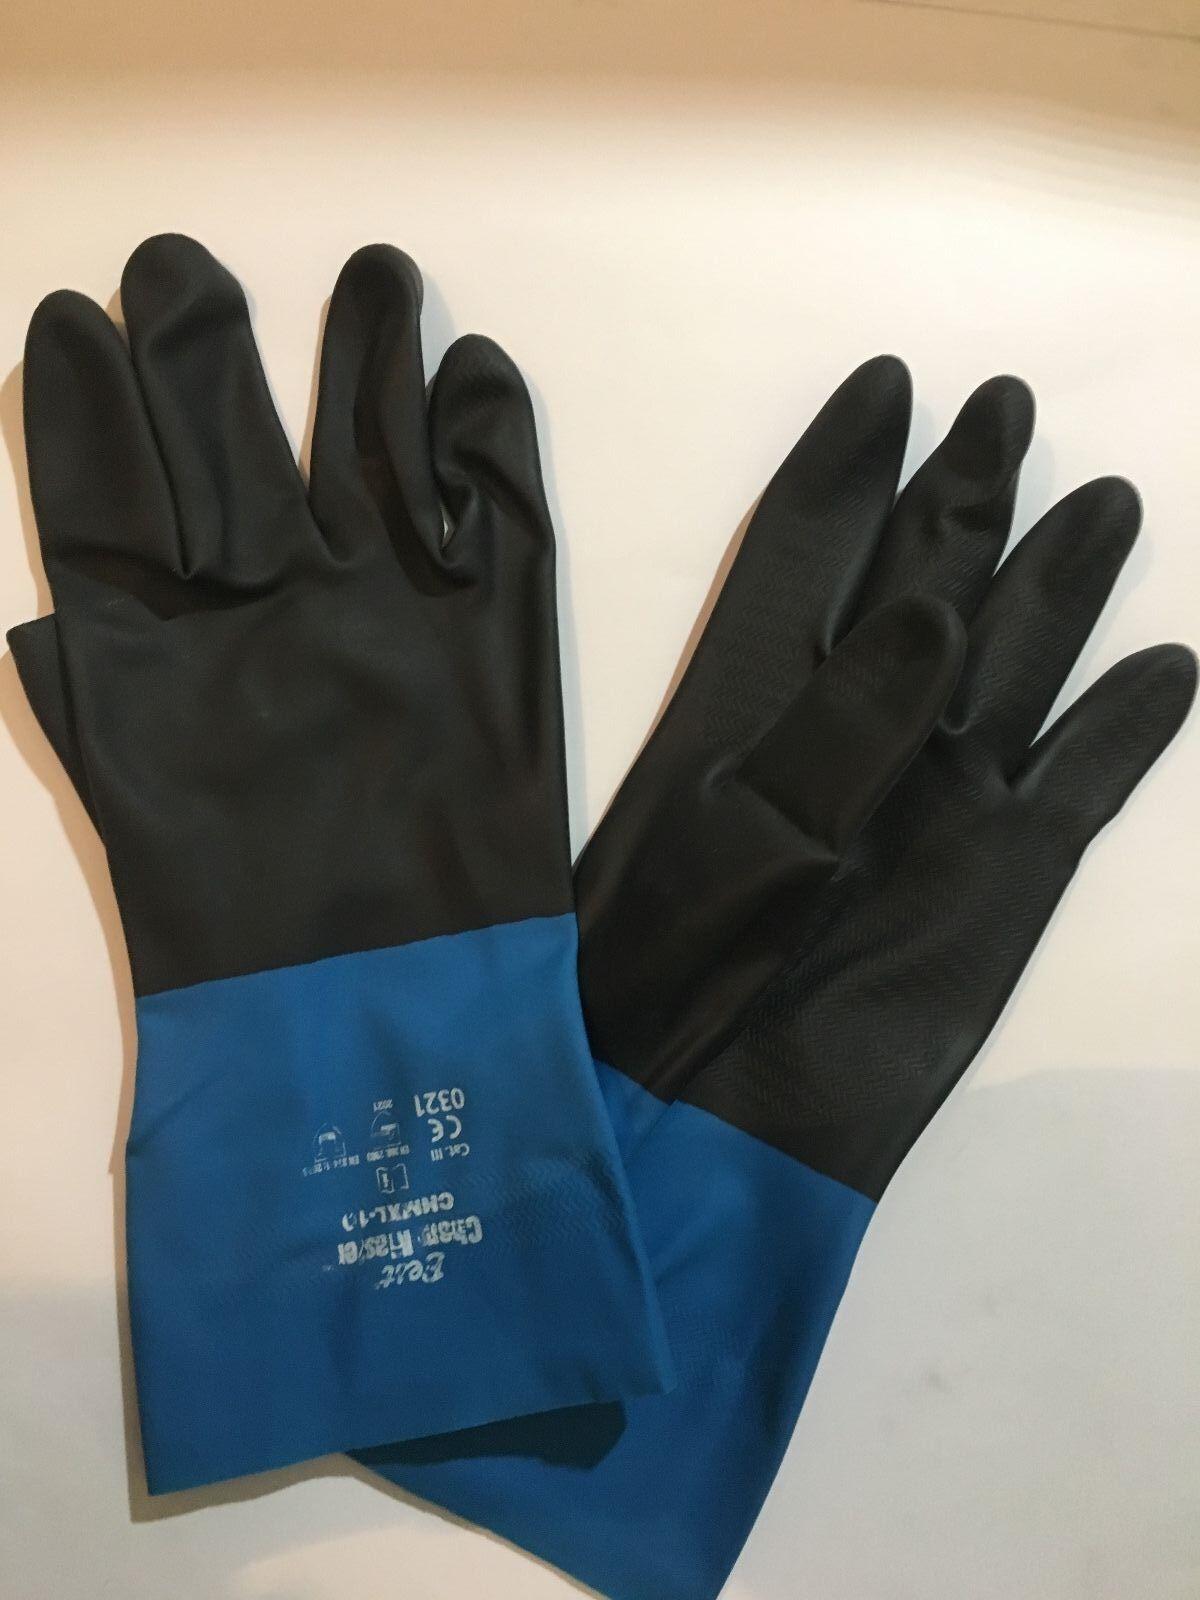 1 PAIR Showa Best CHM Chem Master Neoprene Over Natural Rubber Glove SIZE XL